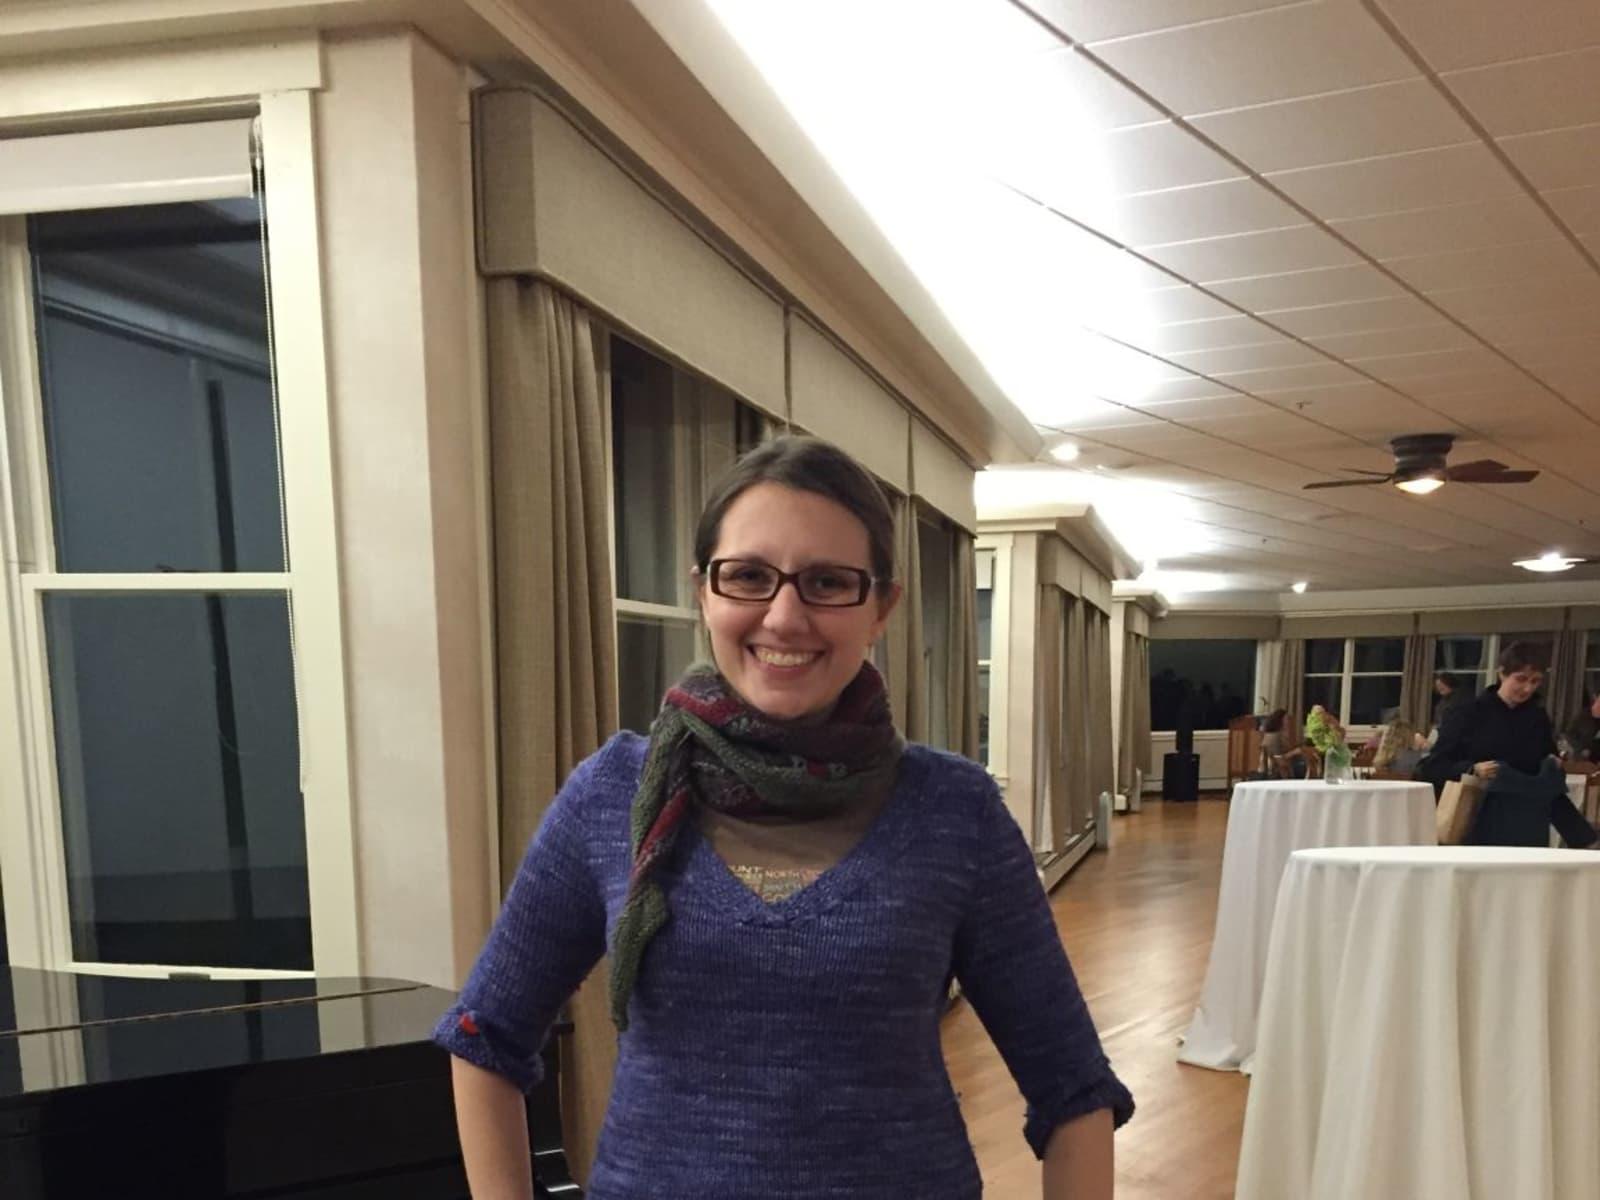 Kate from Boston, Massachusetts, United States